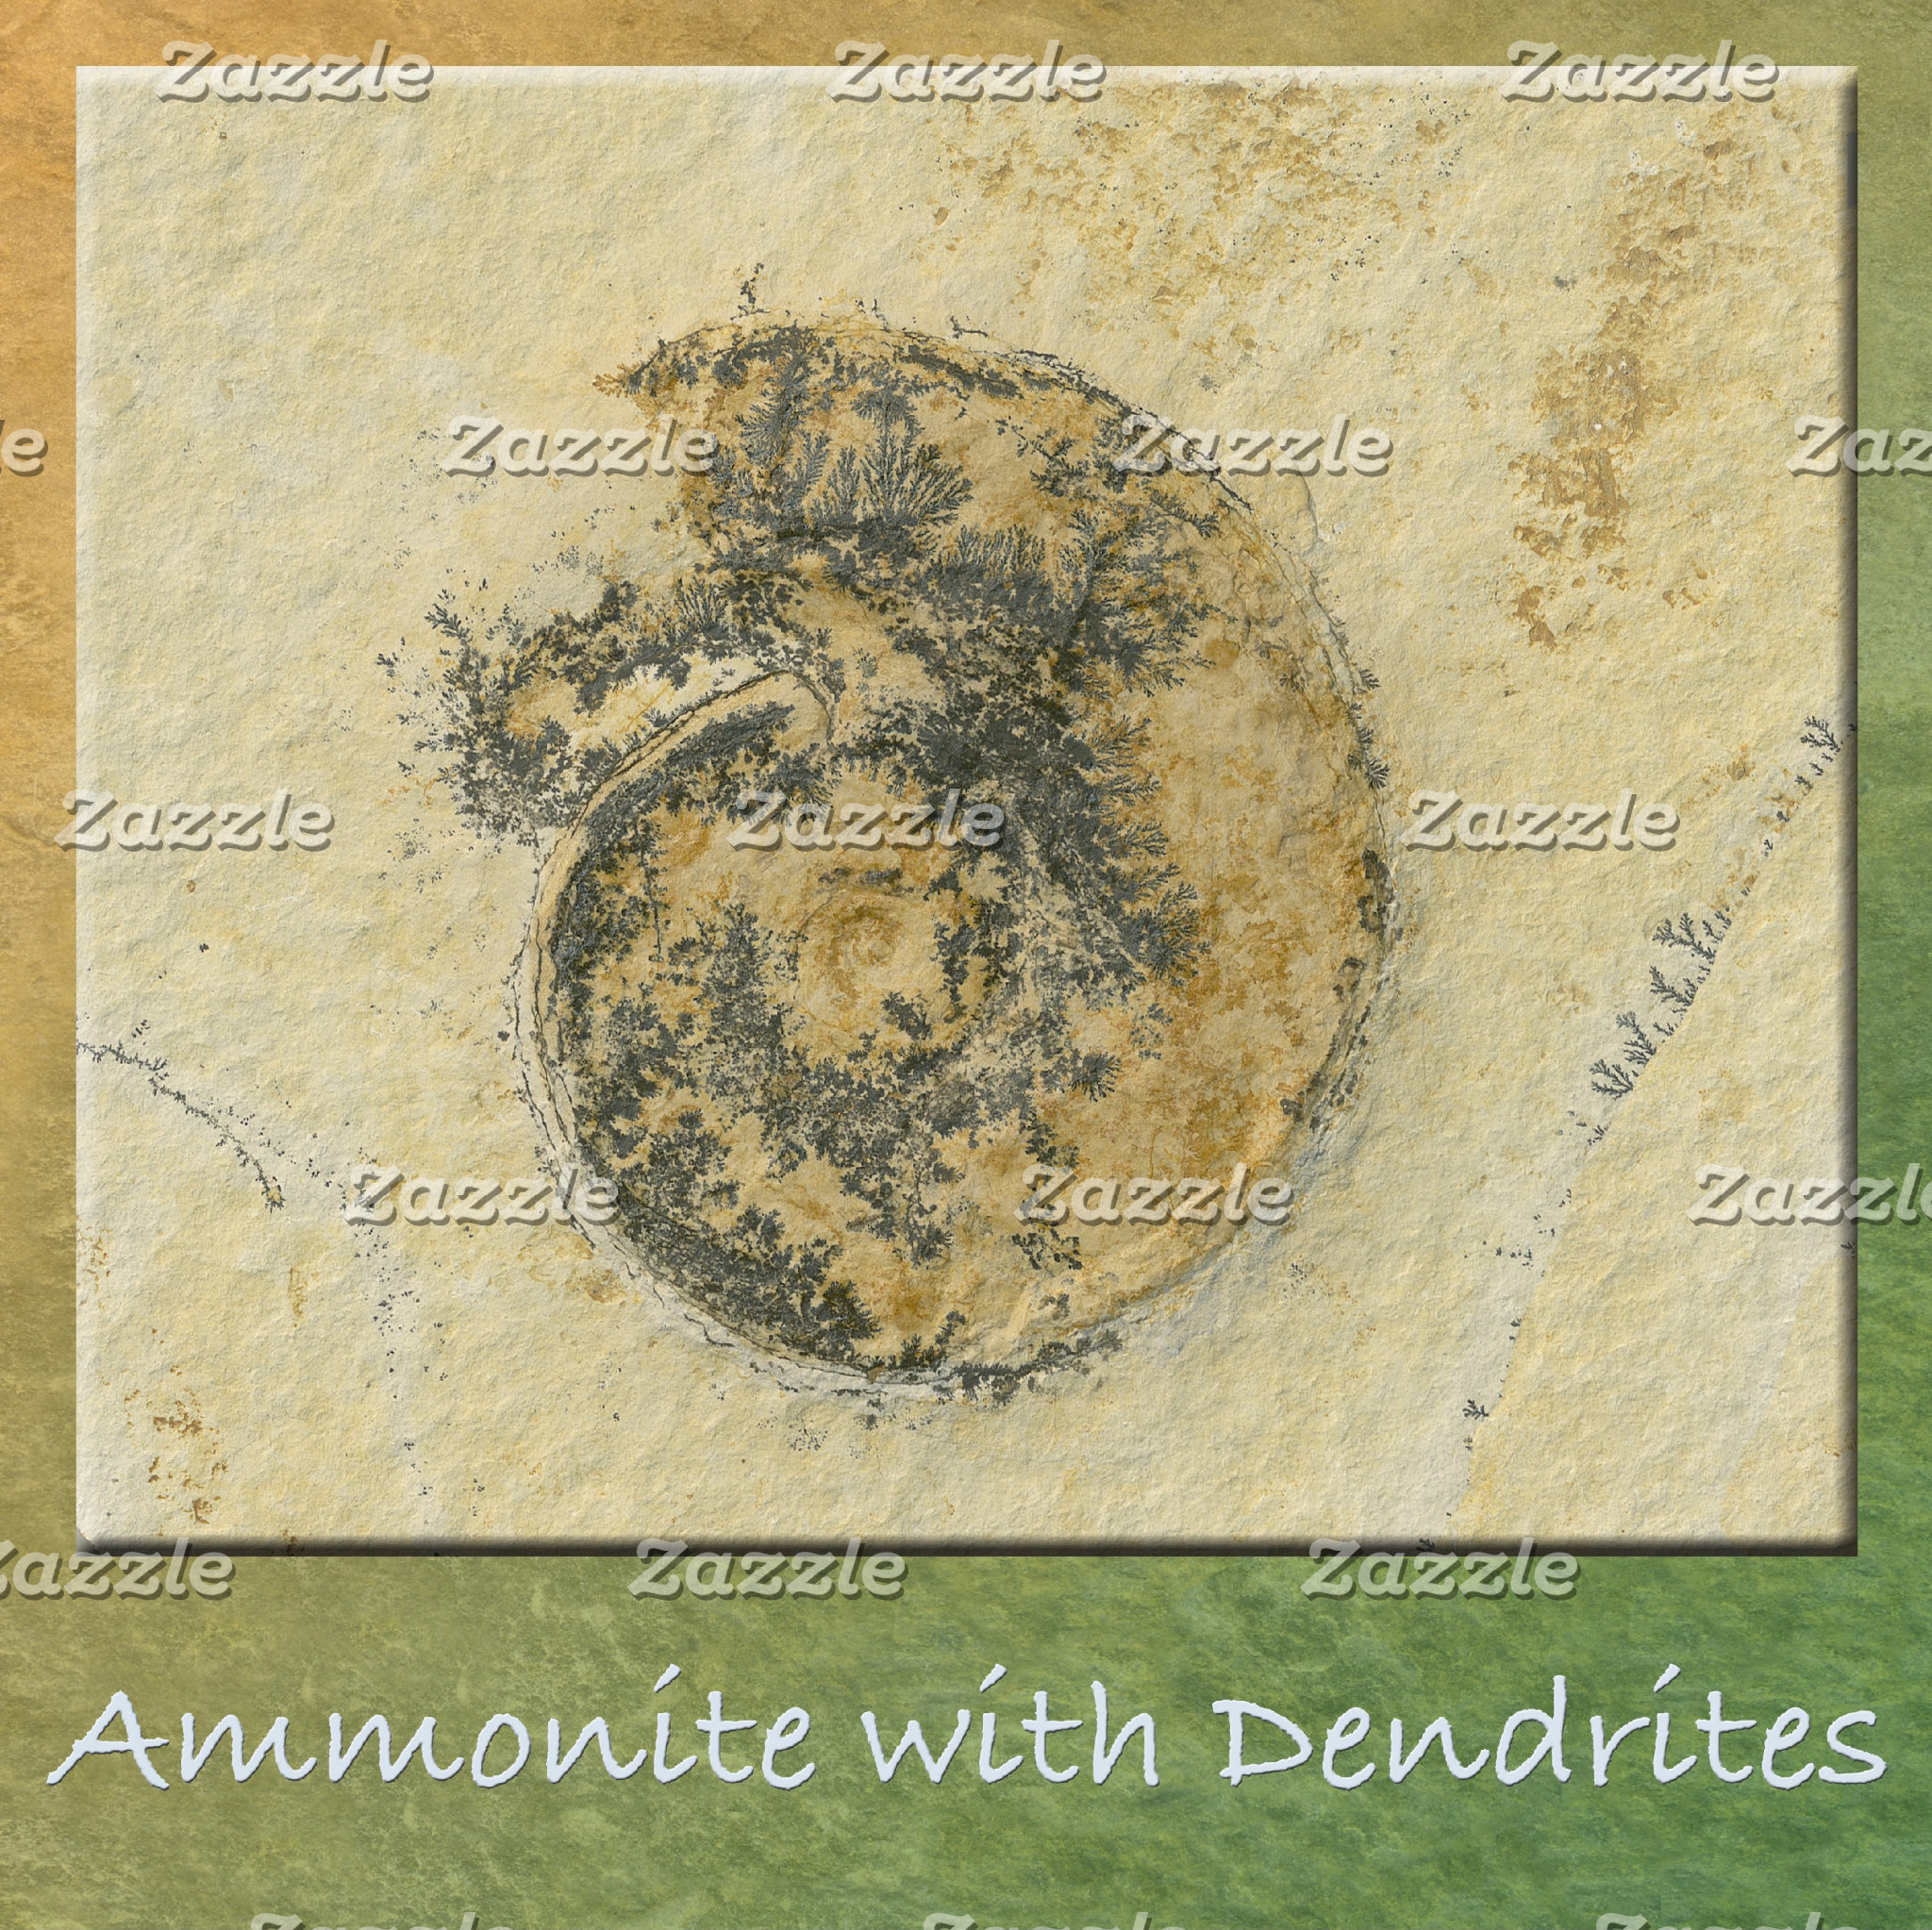 Ammonite with Dendrites